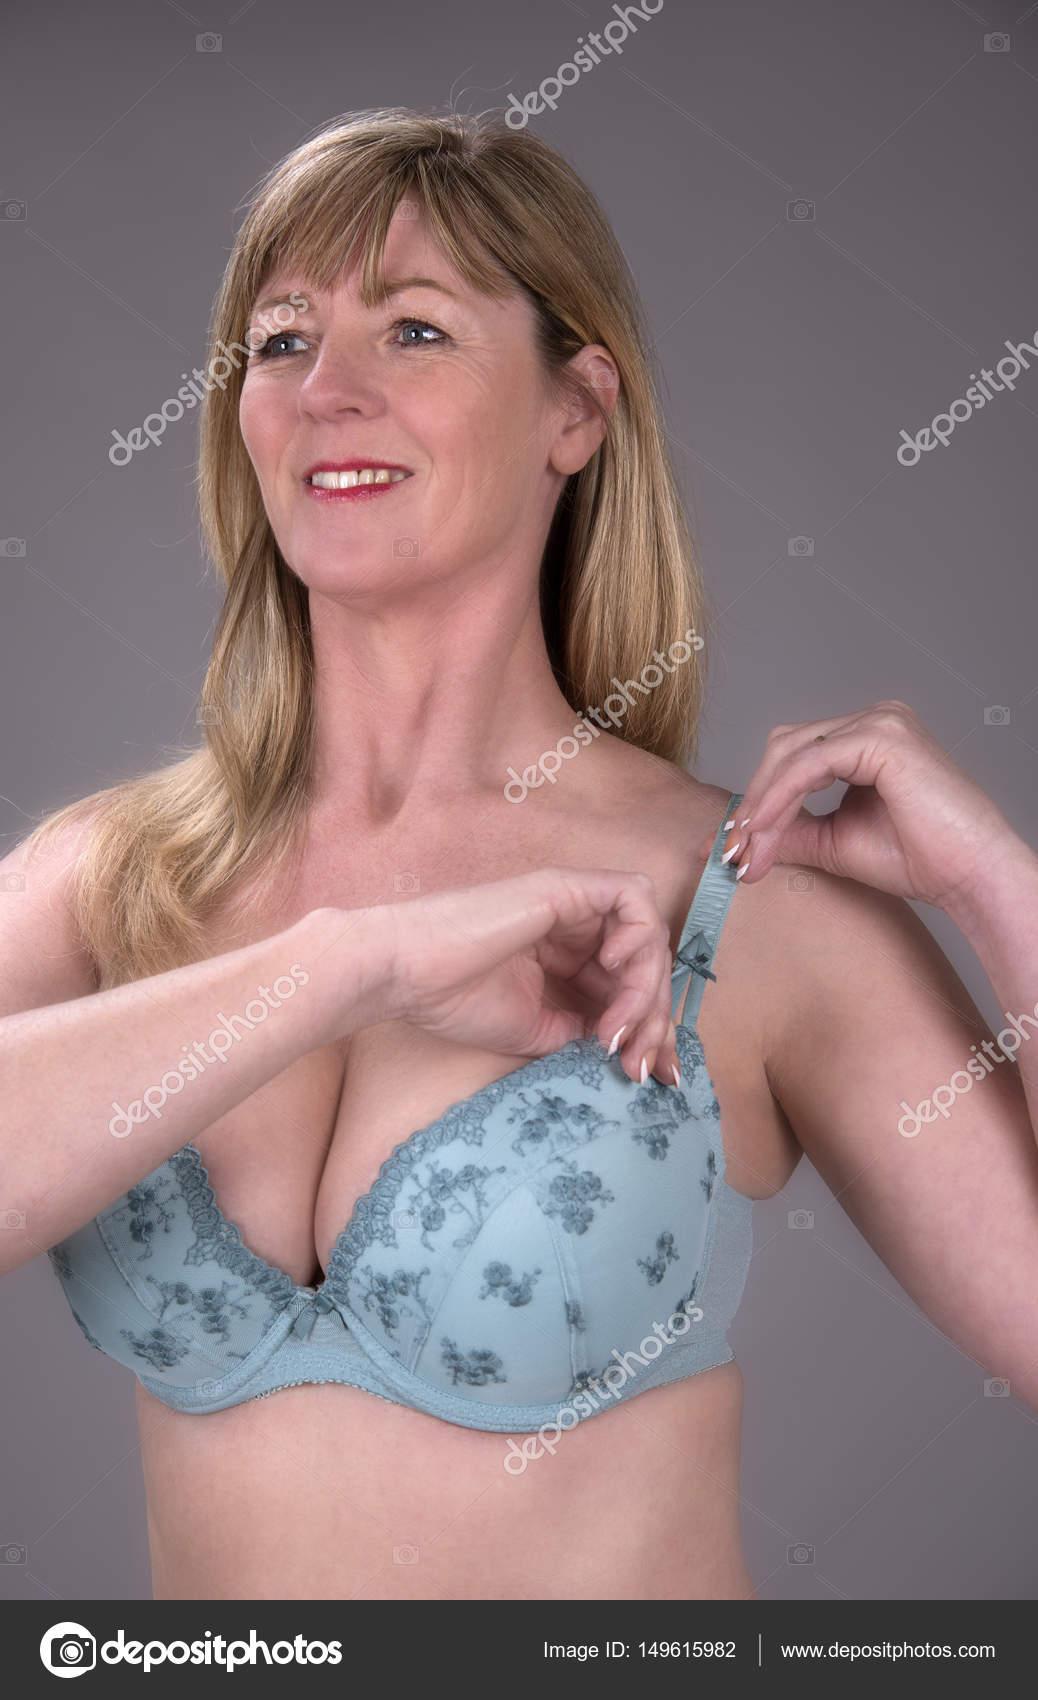 woman adjusting bra